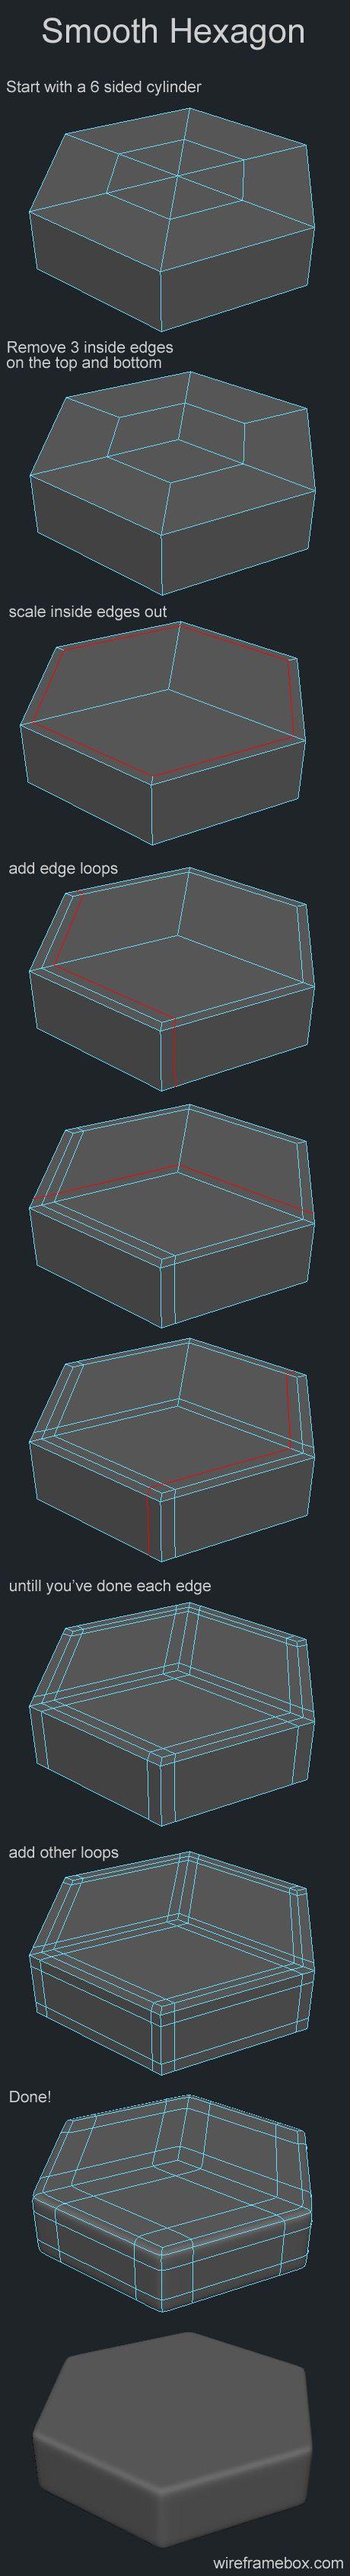 Smooth Hexagon Modeling